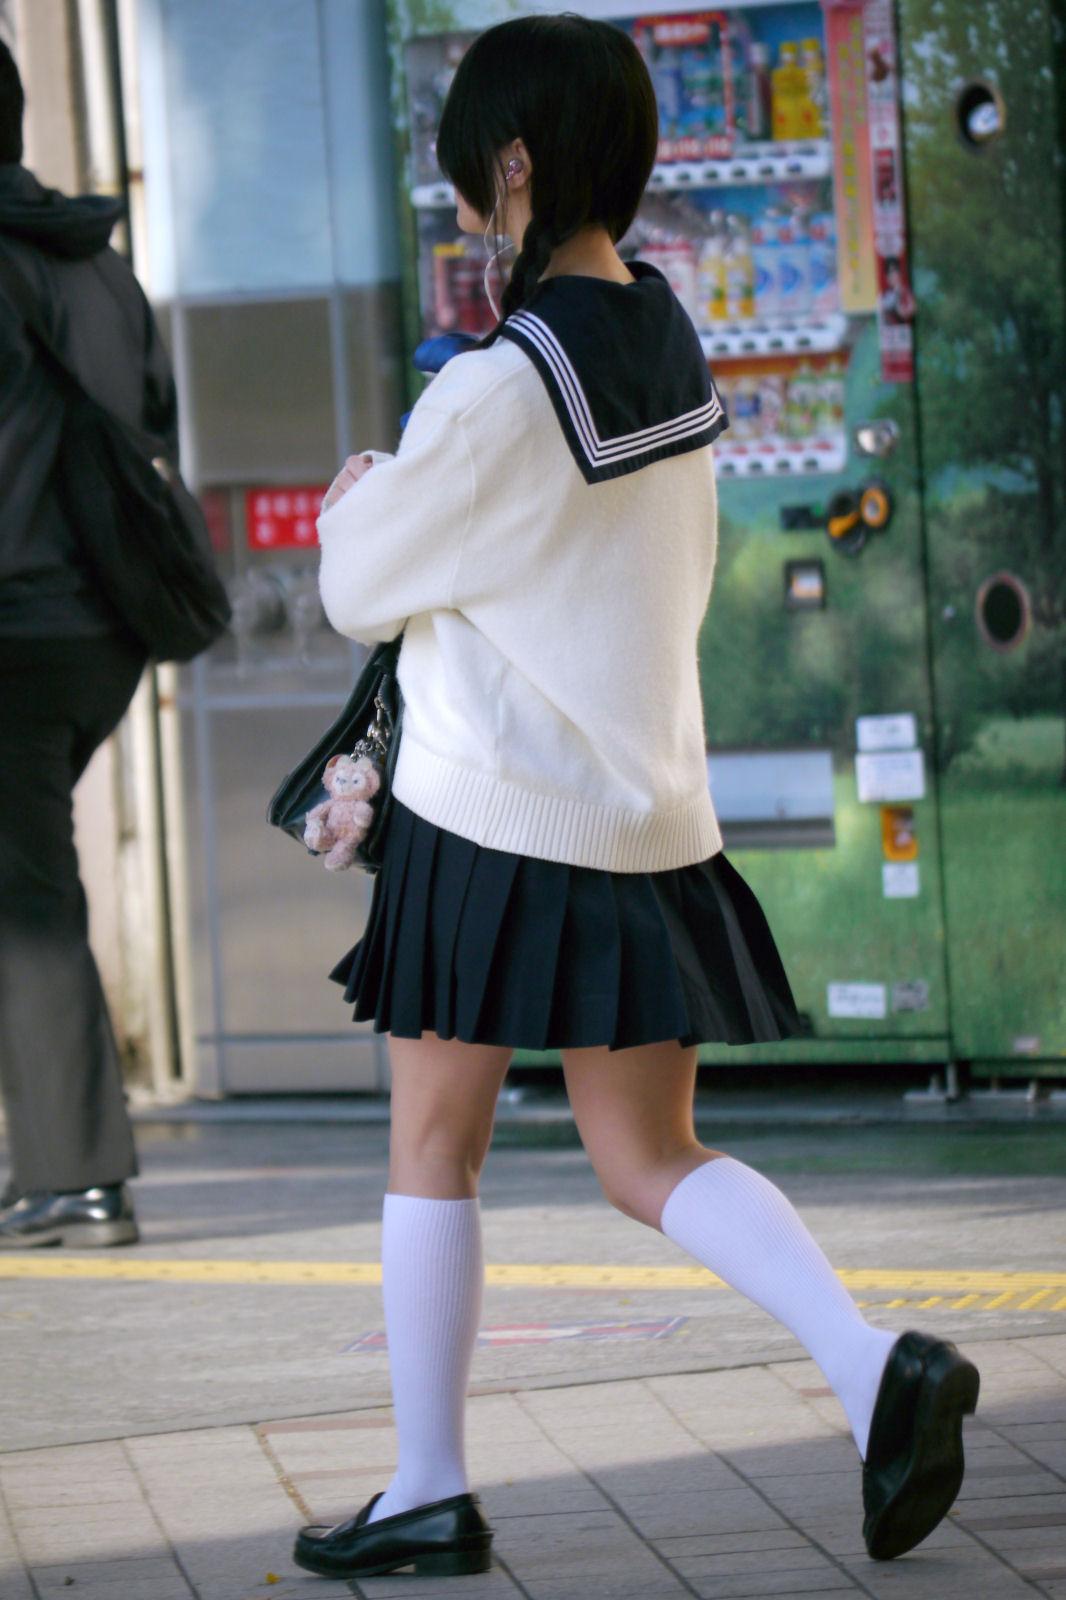 JK_生足_美脚_街中_エロ画像_05